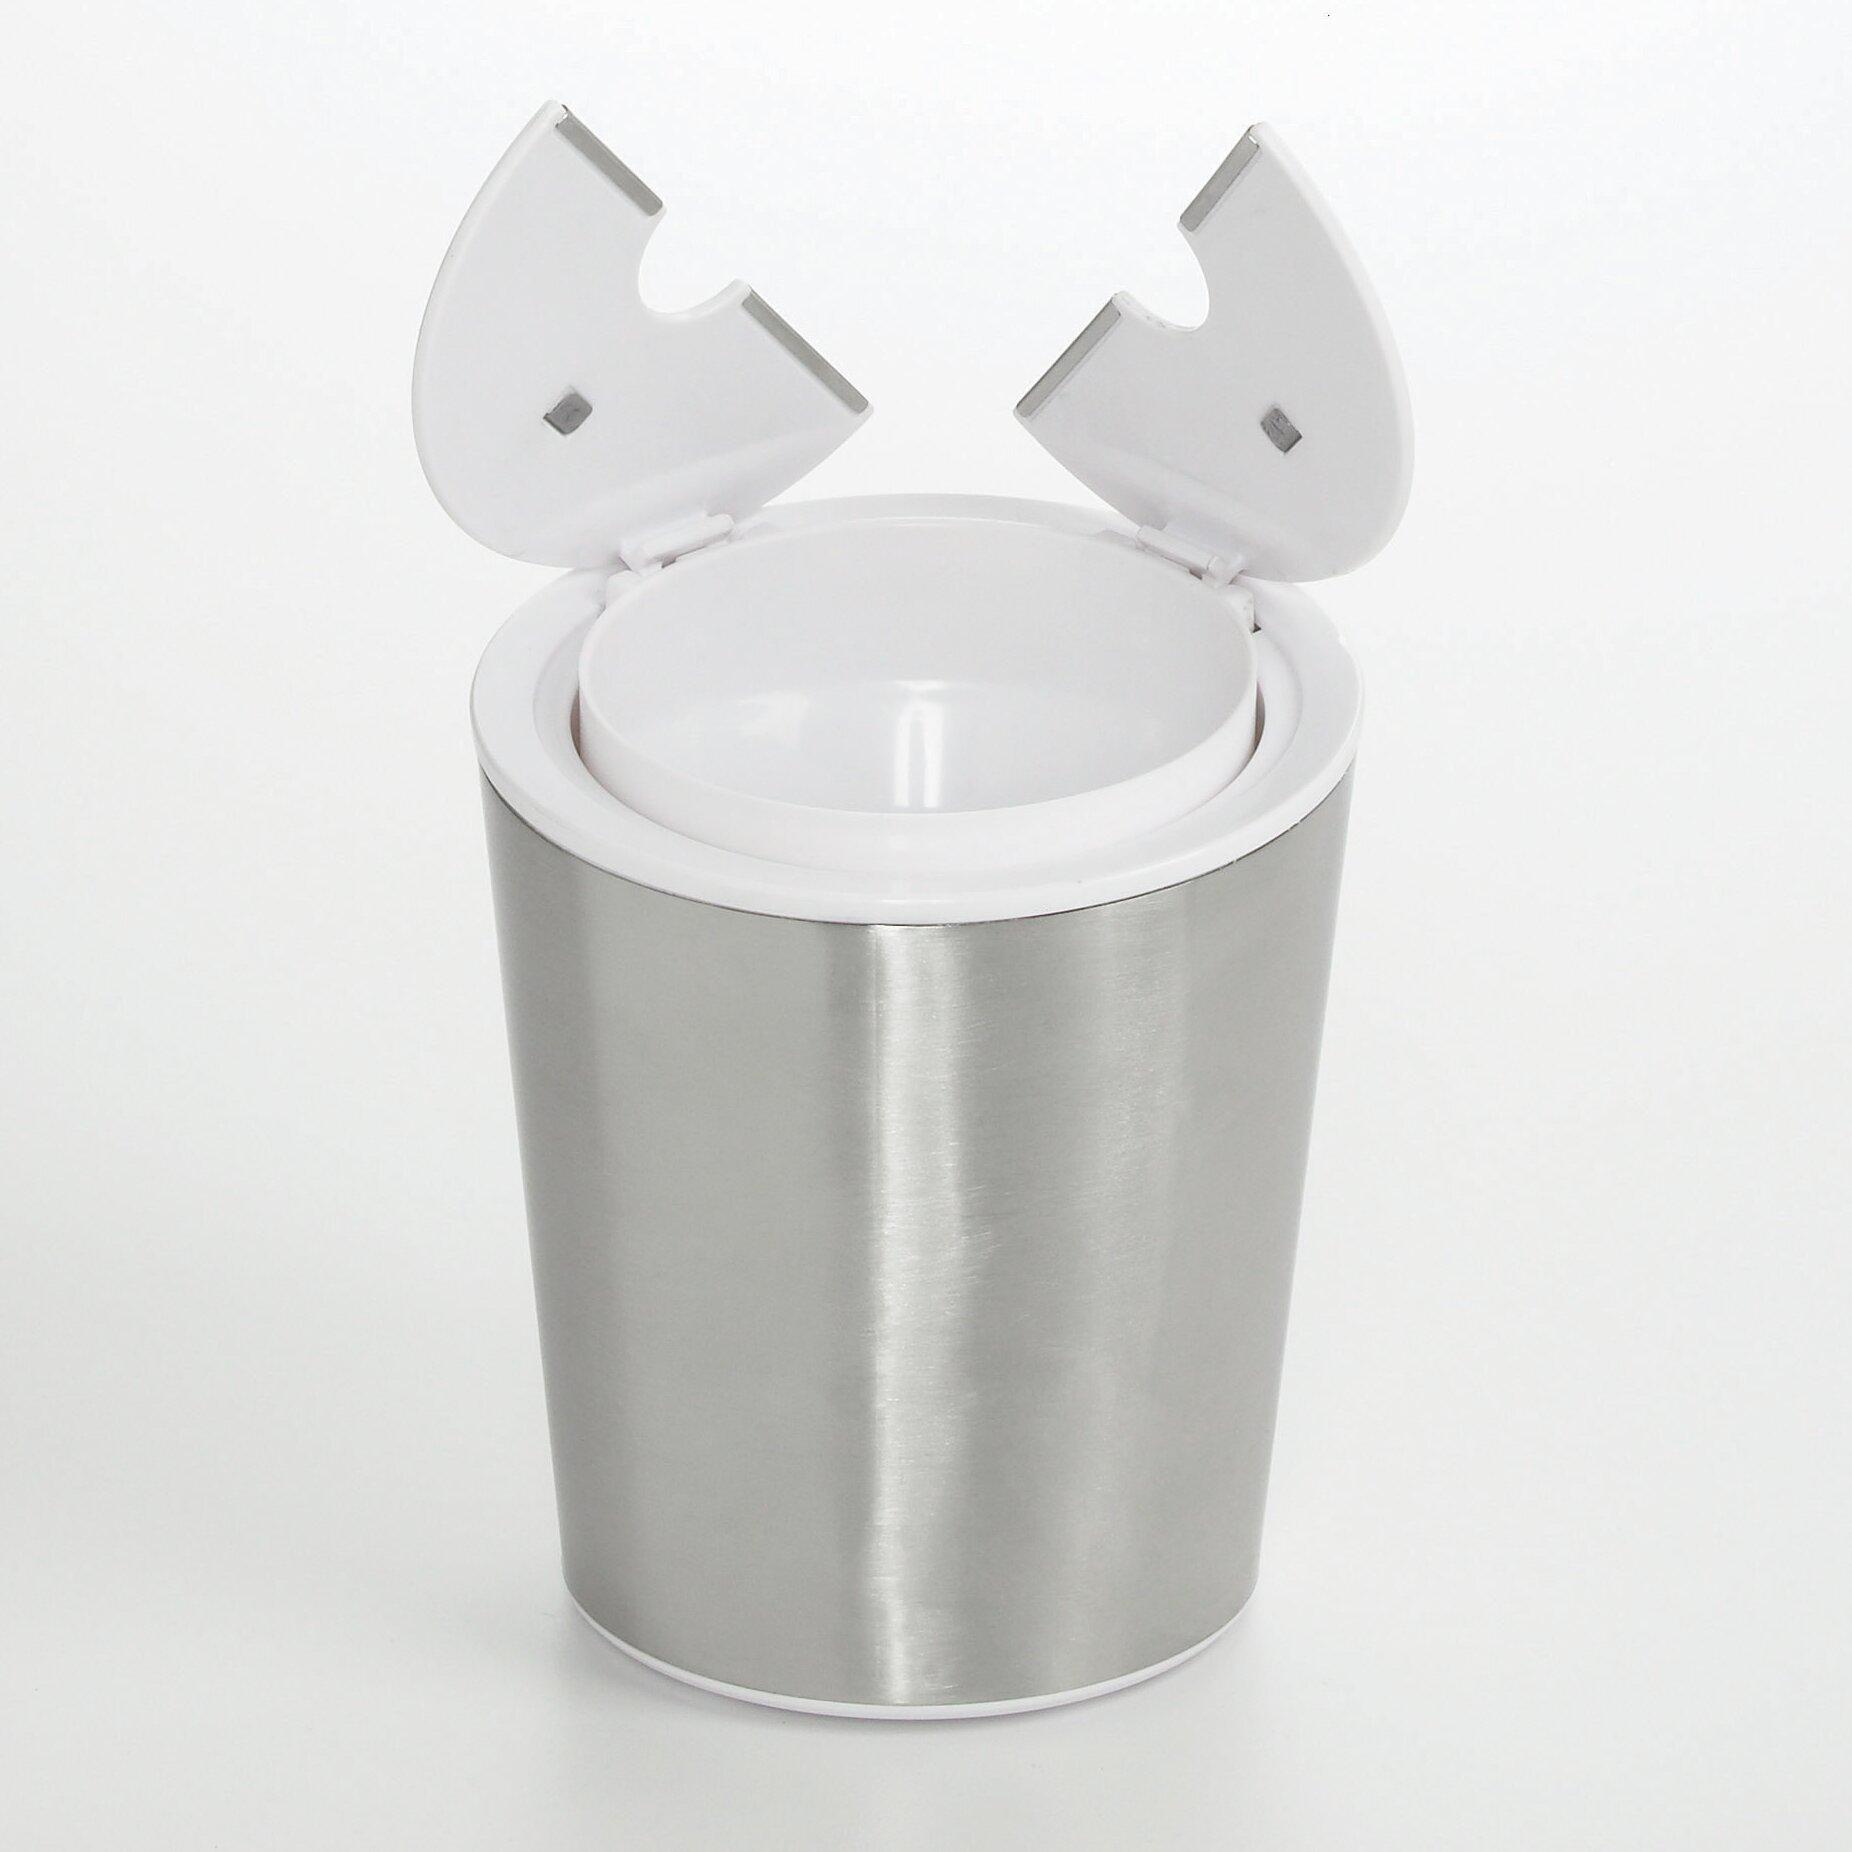 Oxo Good Grips Stainless Steel Round Toilet Brush